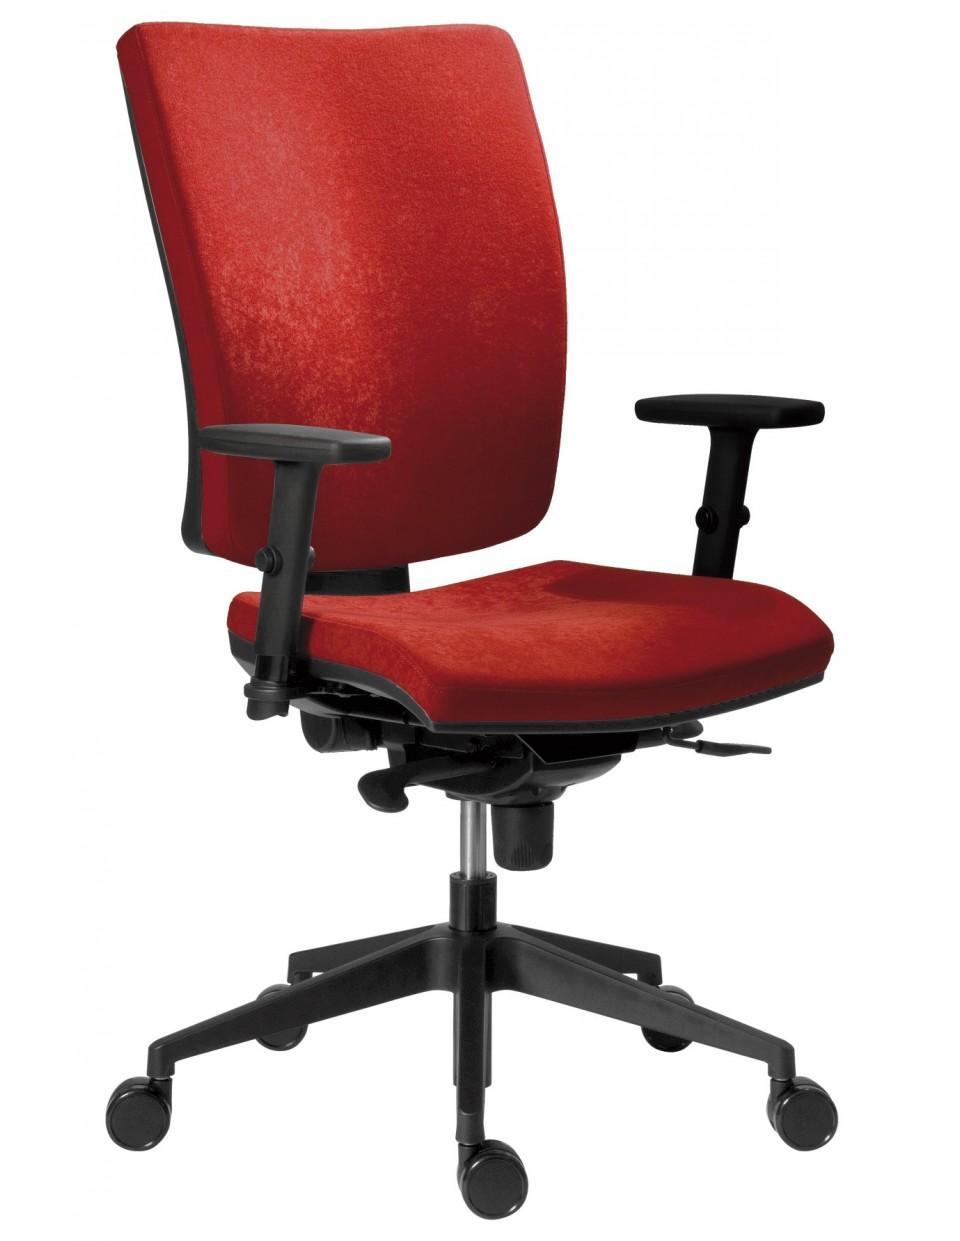 uredska-stolica-1580-gala-ny-plus